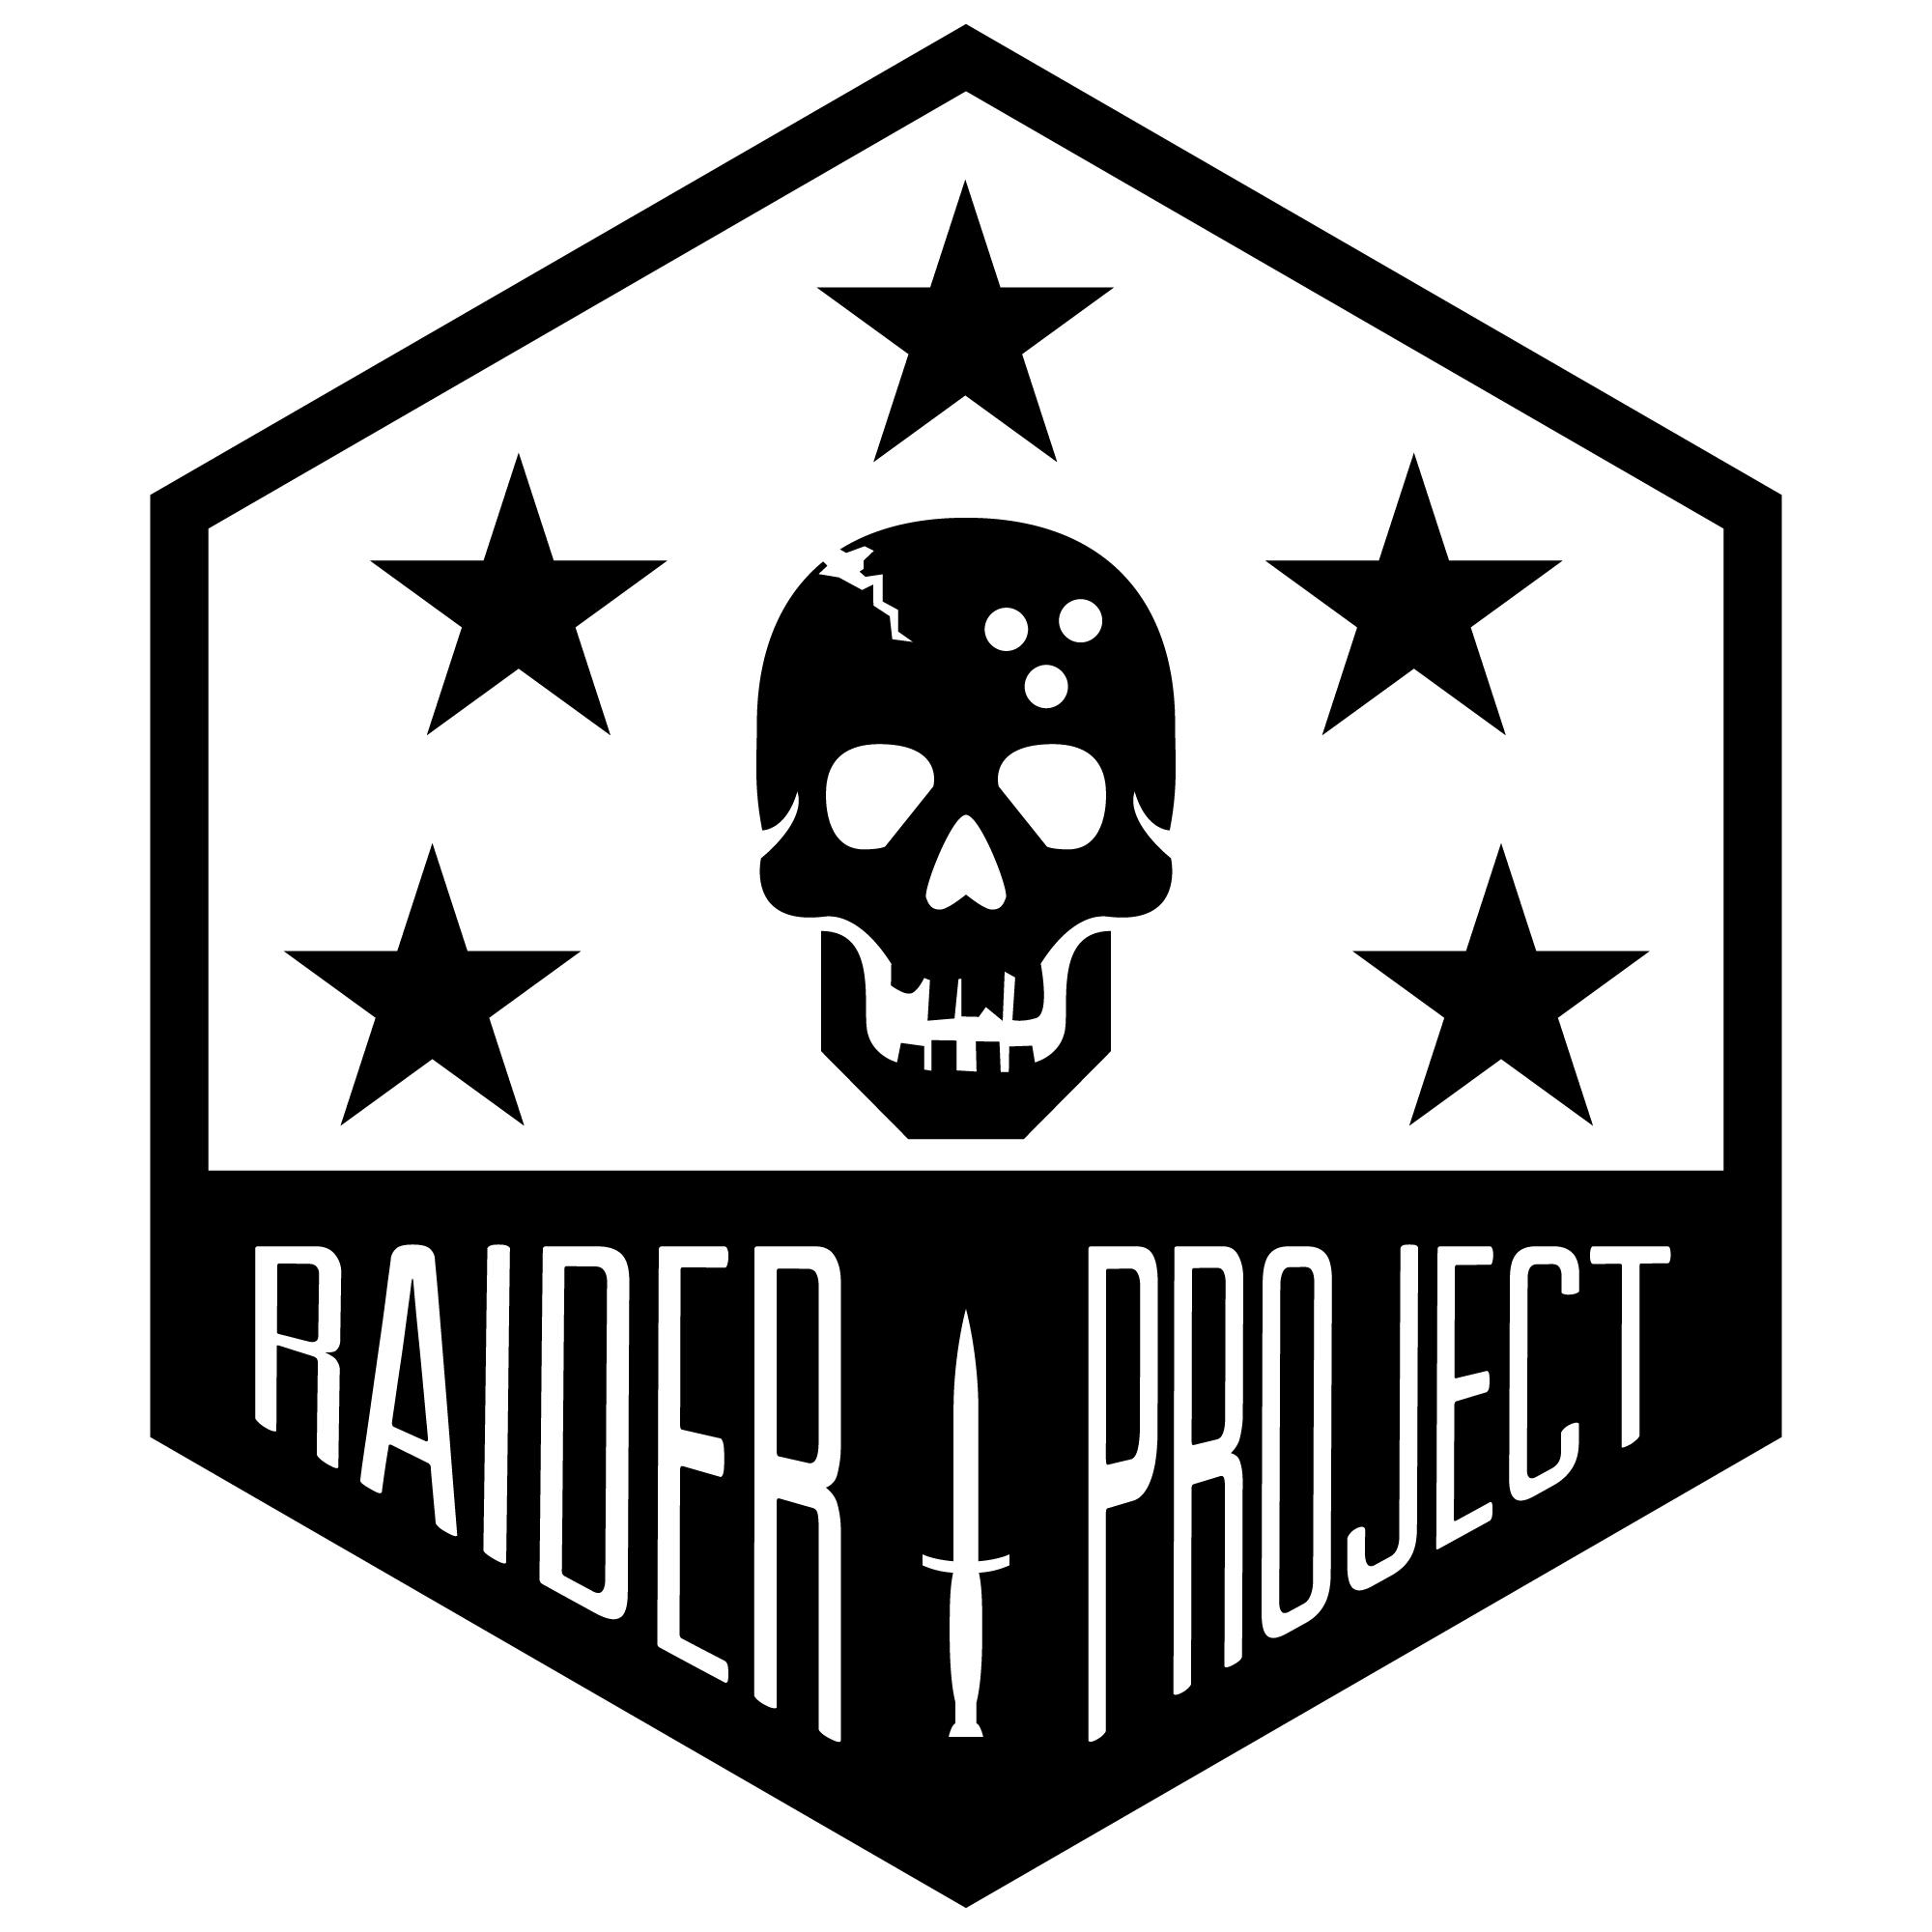 Raider-Project-Black-NoFill.png